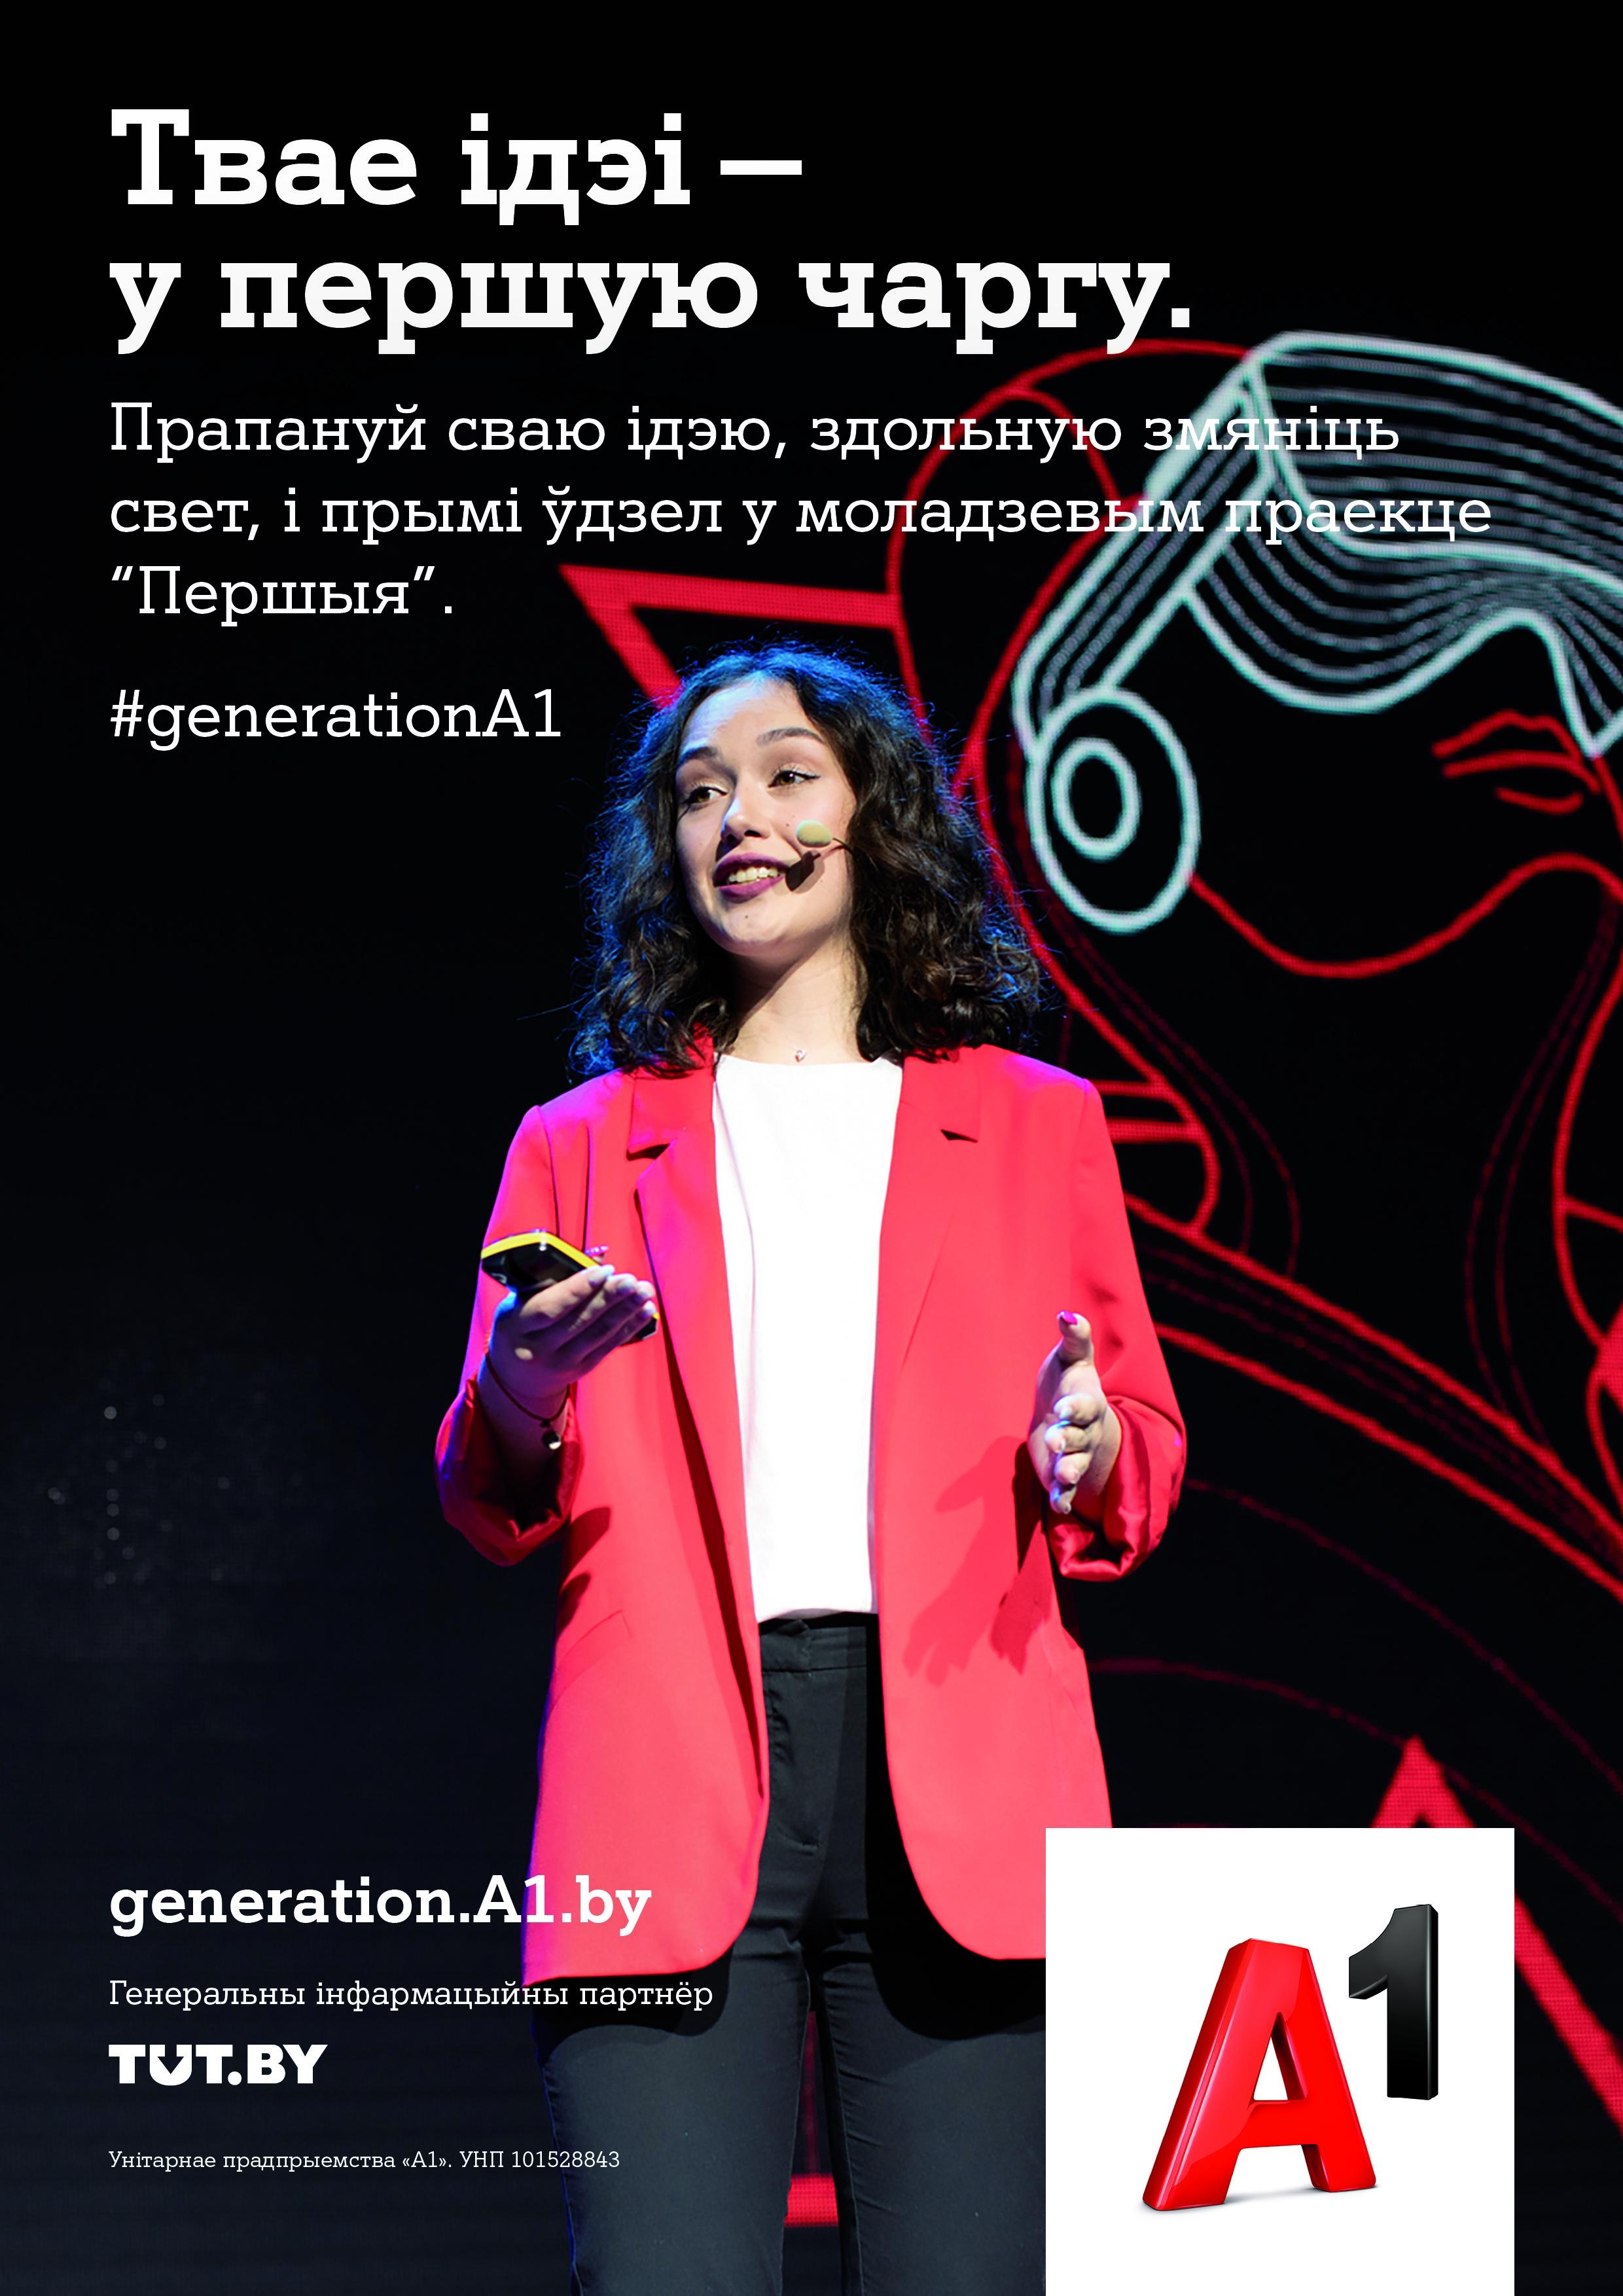 Фото: generation.a1.by